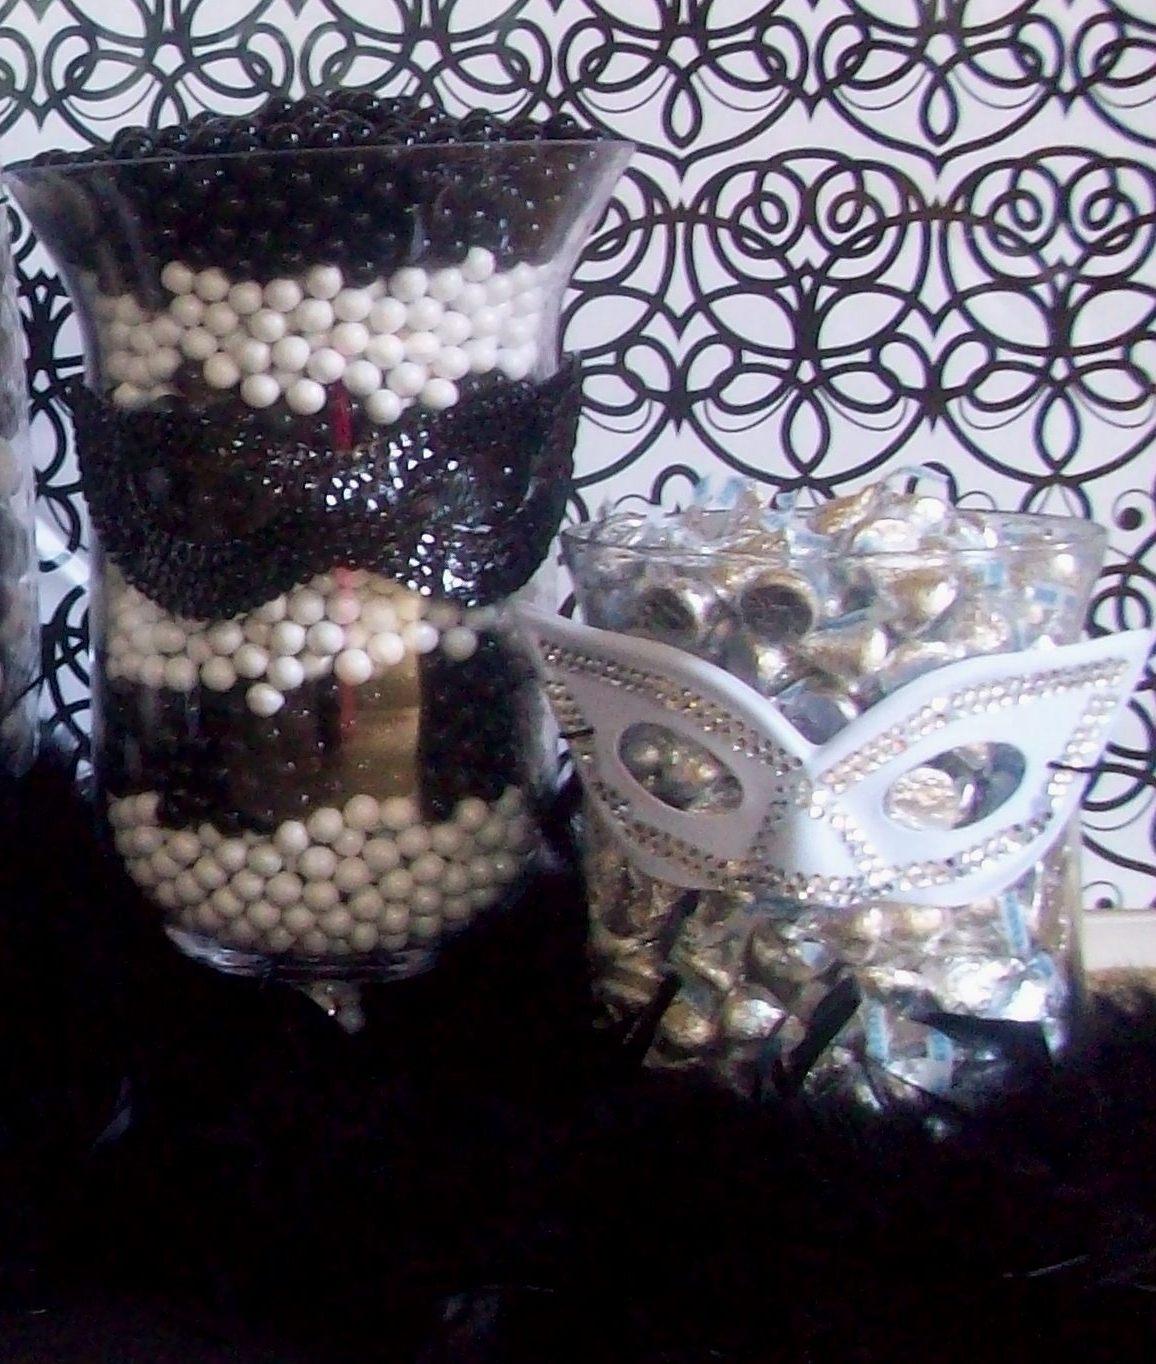 Susan crabtree masquerade candy bar